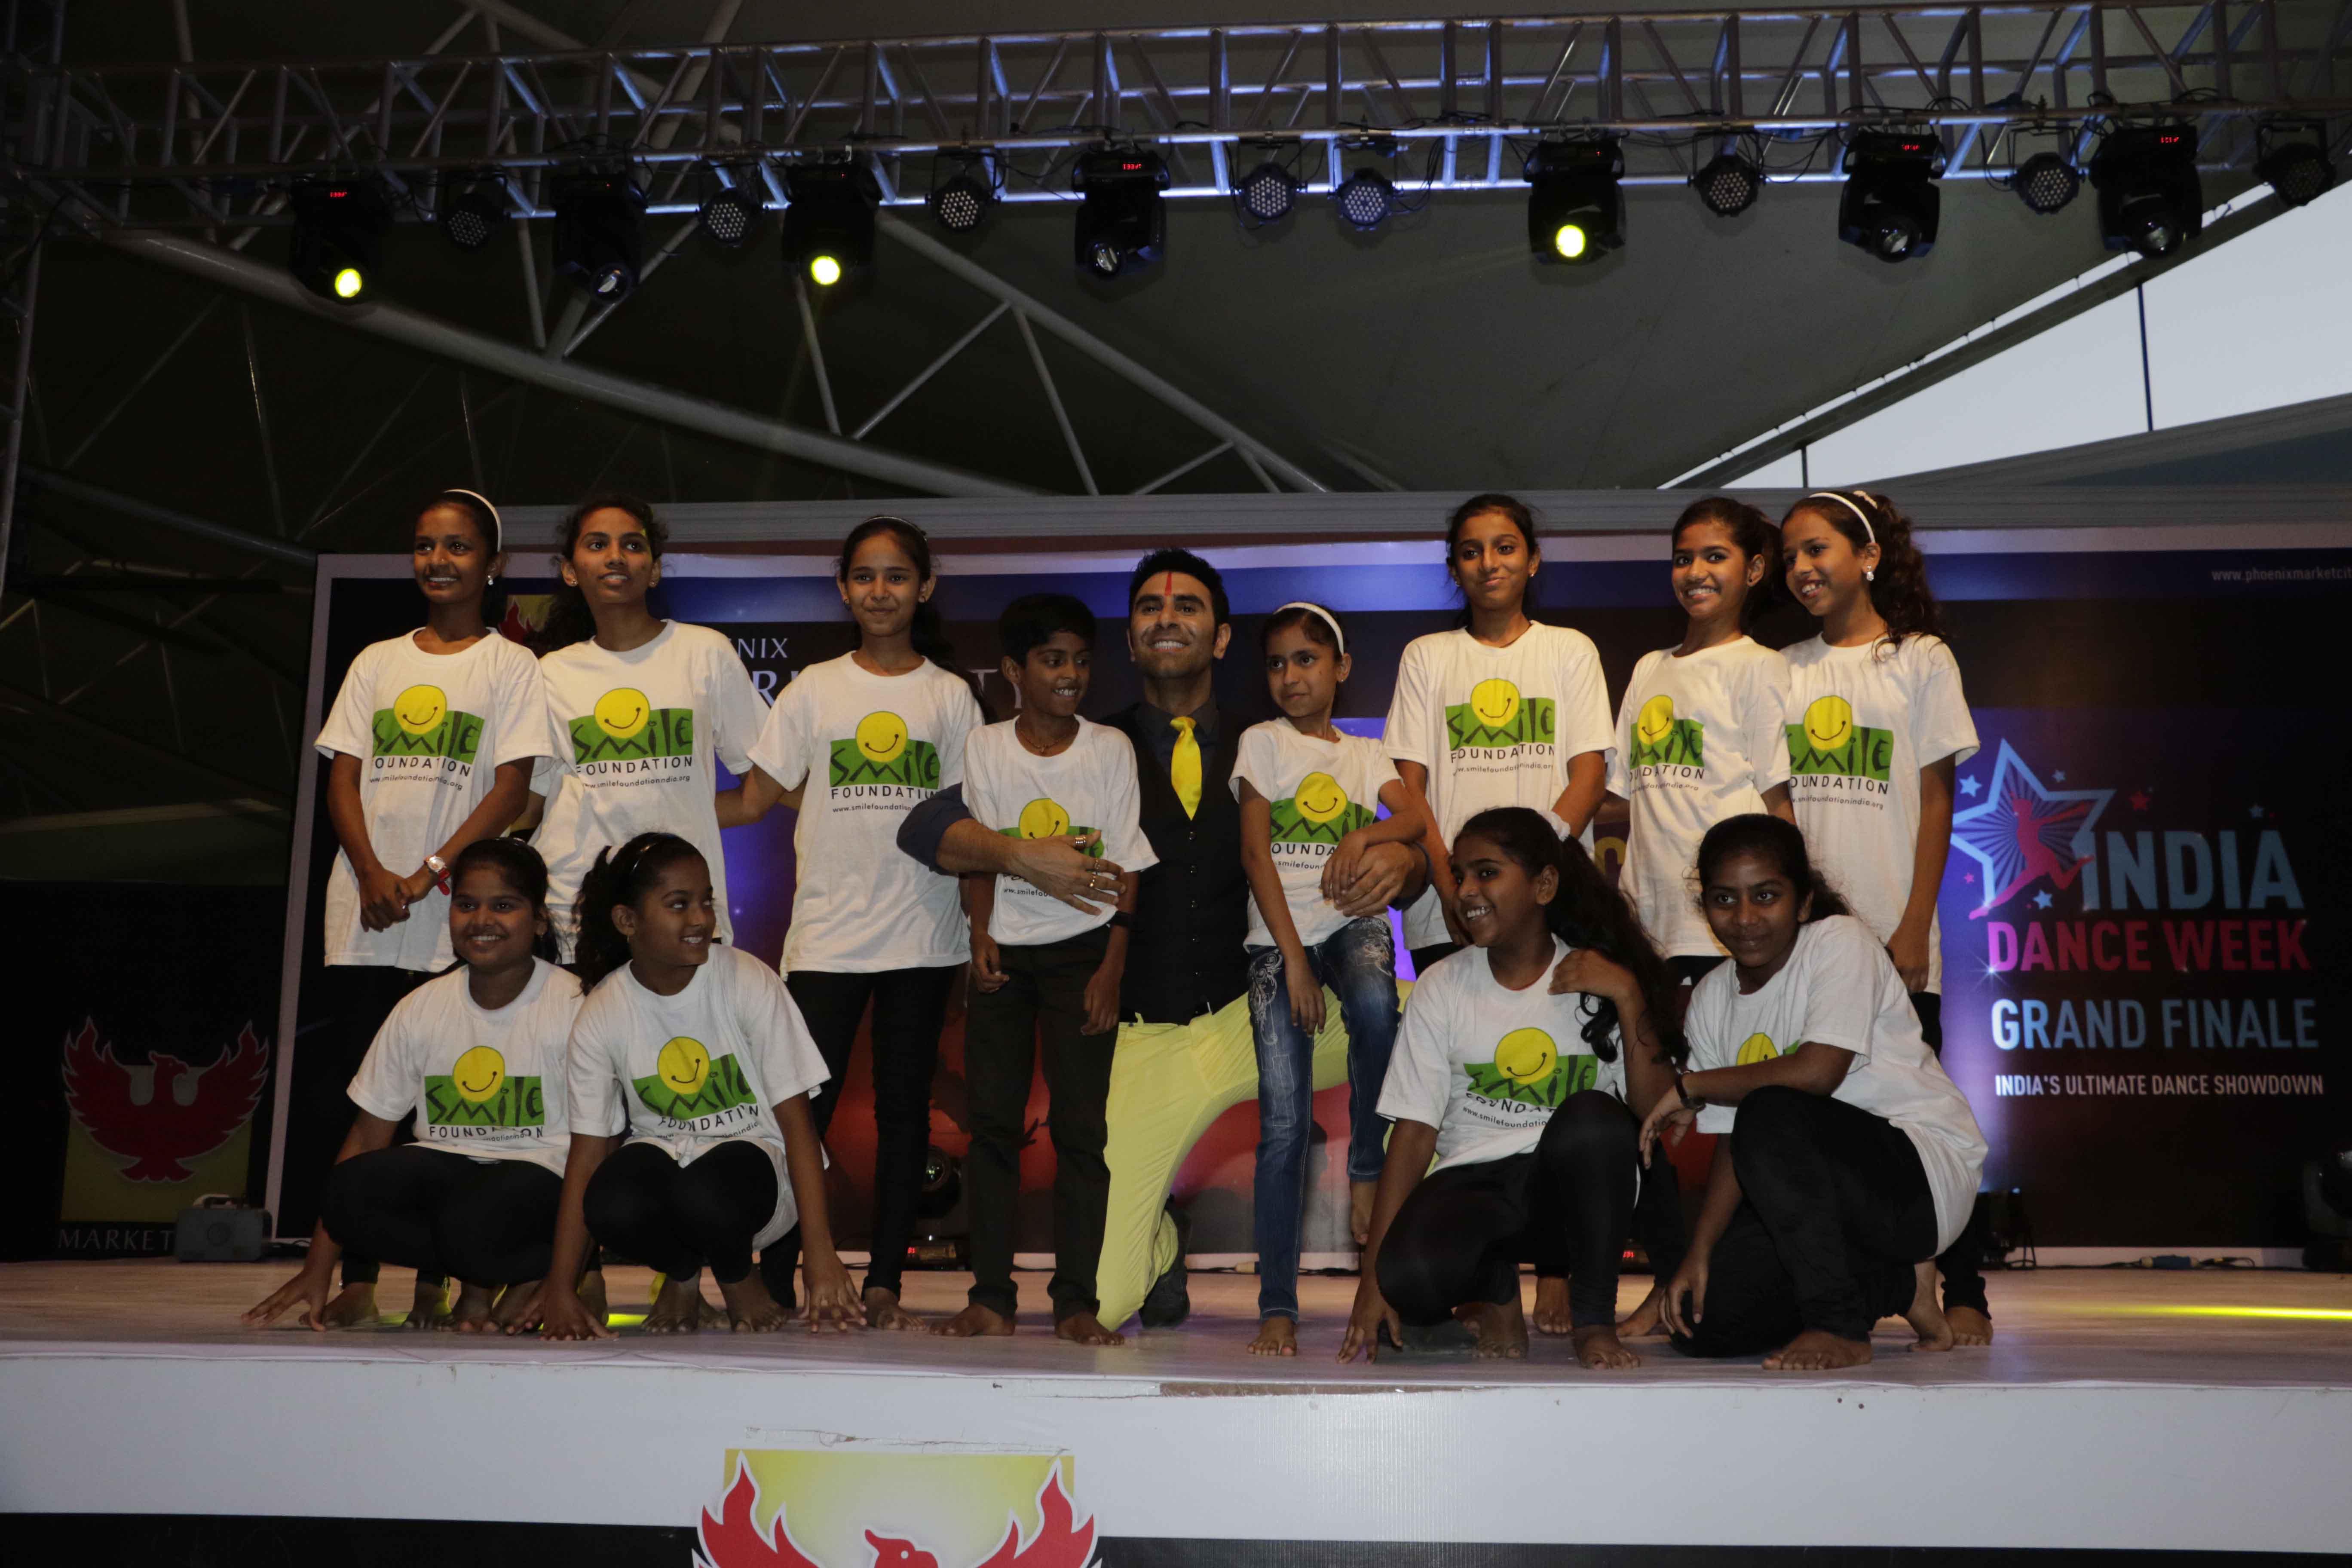 Sandip Soparrkar performing with Smile Foundation Children